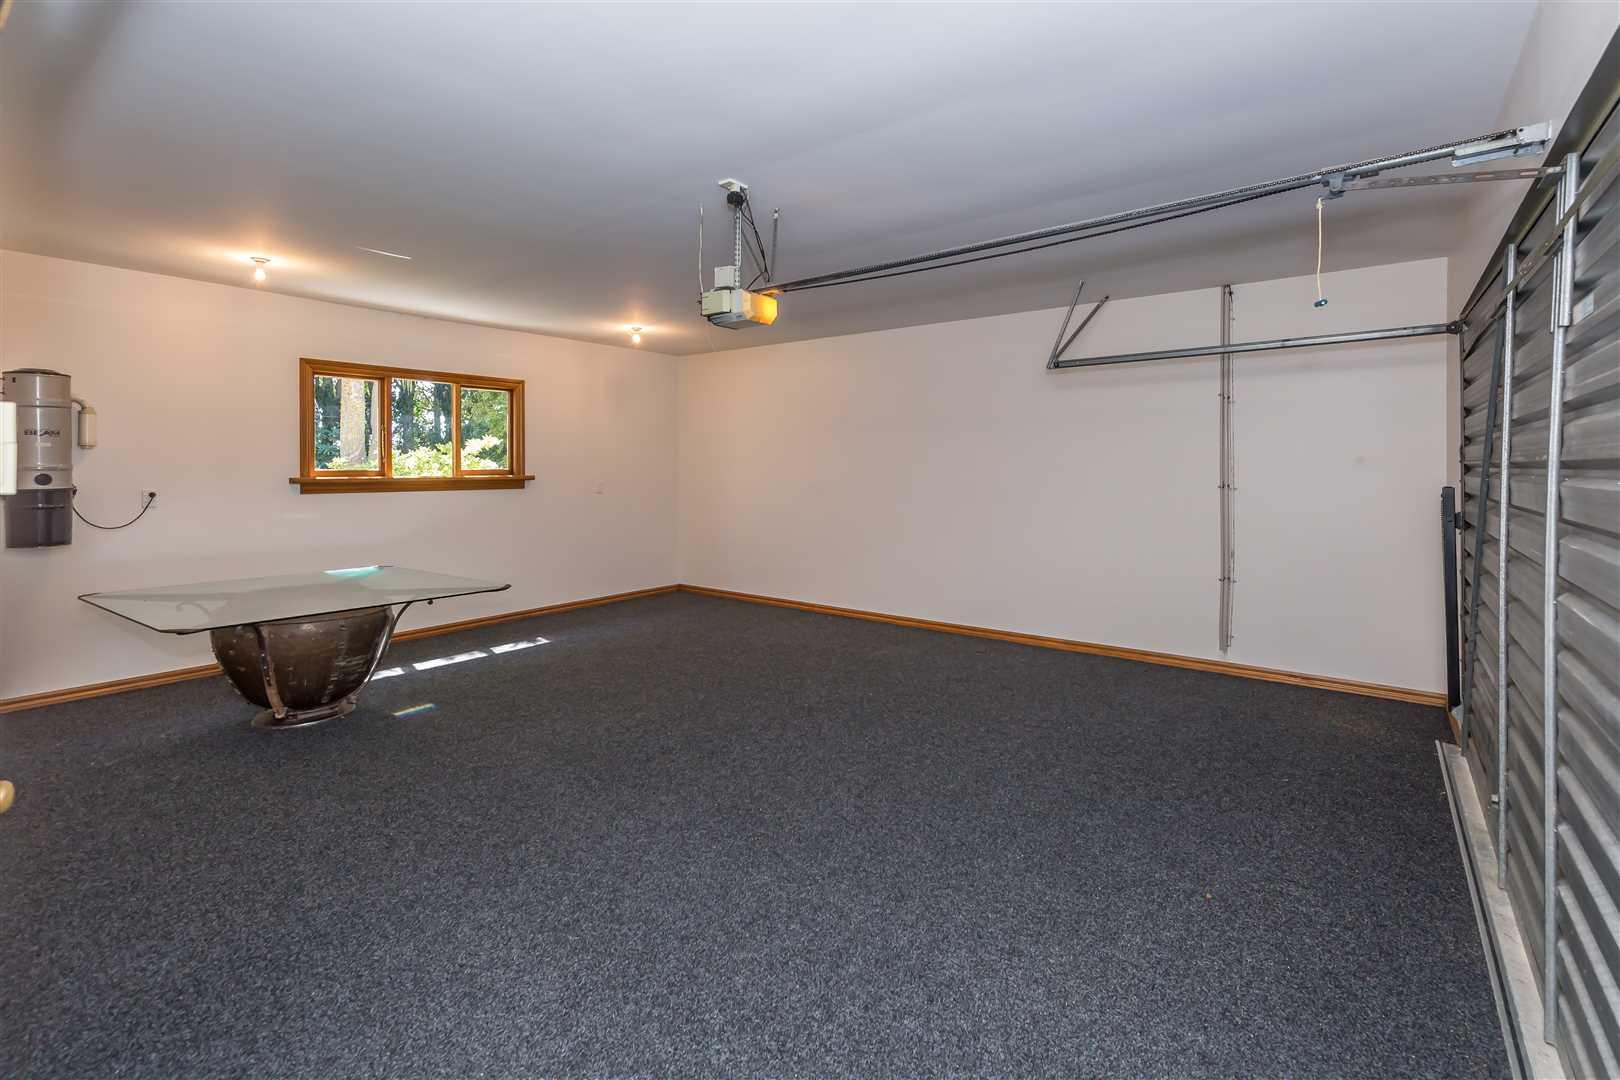 Garage, internal access for 2 vehicles